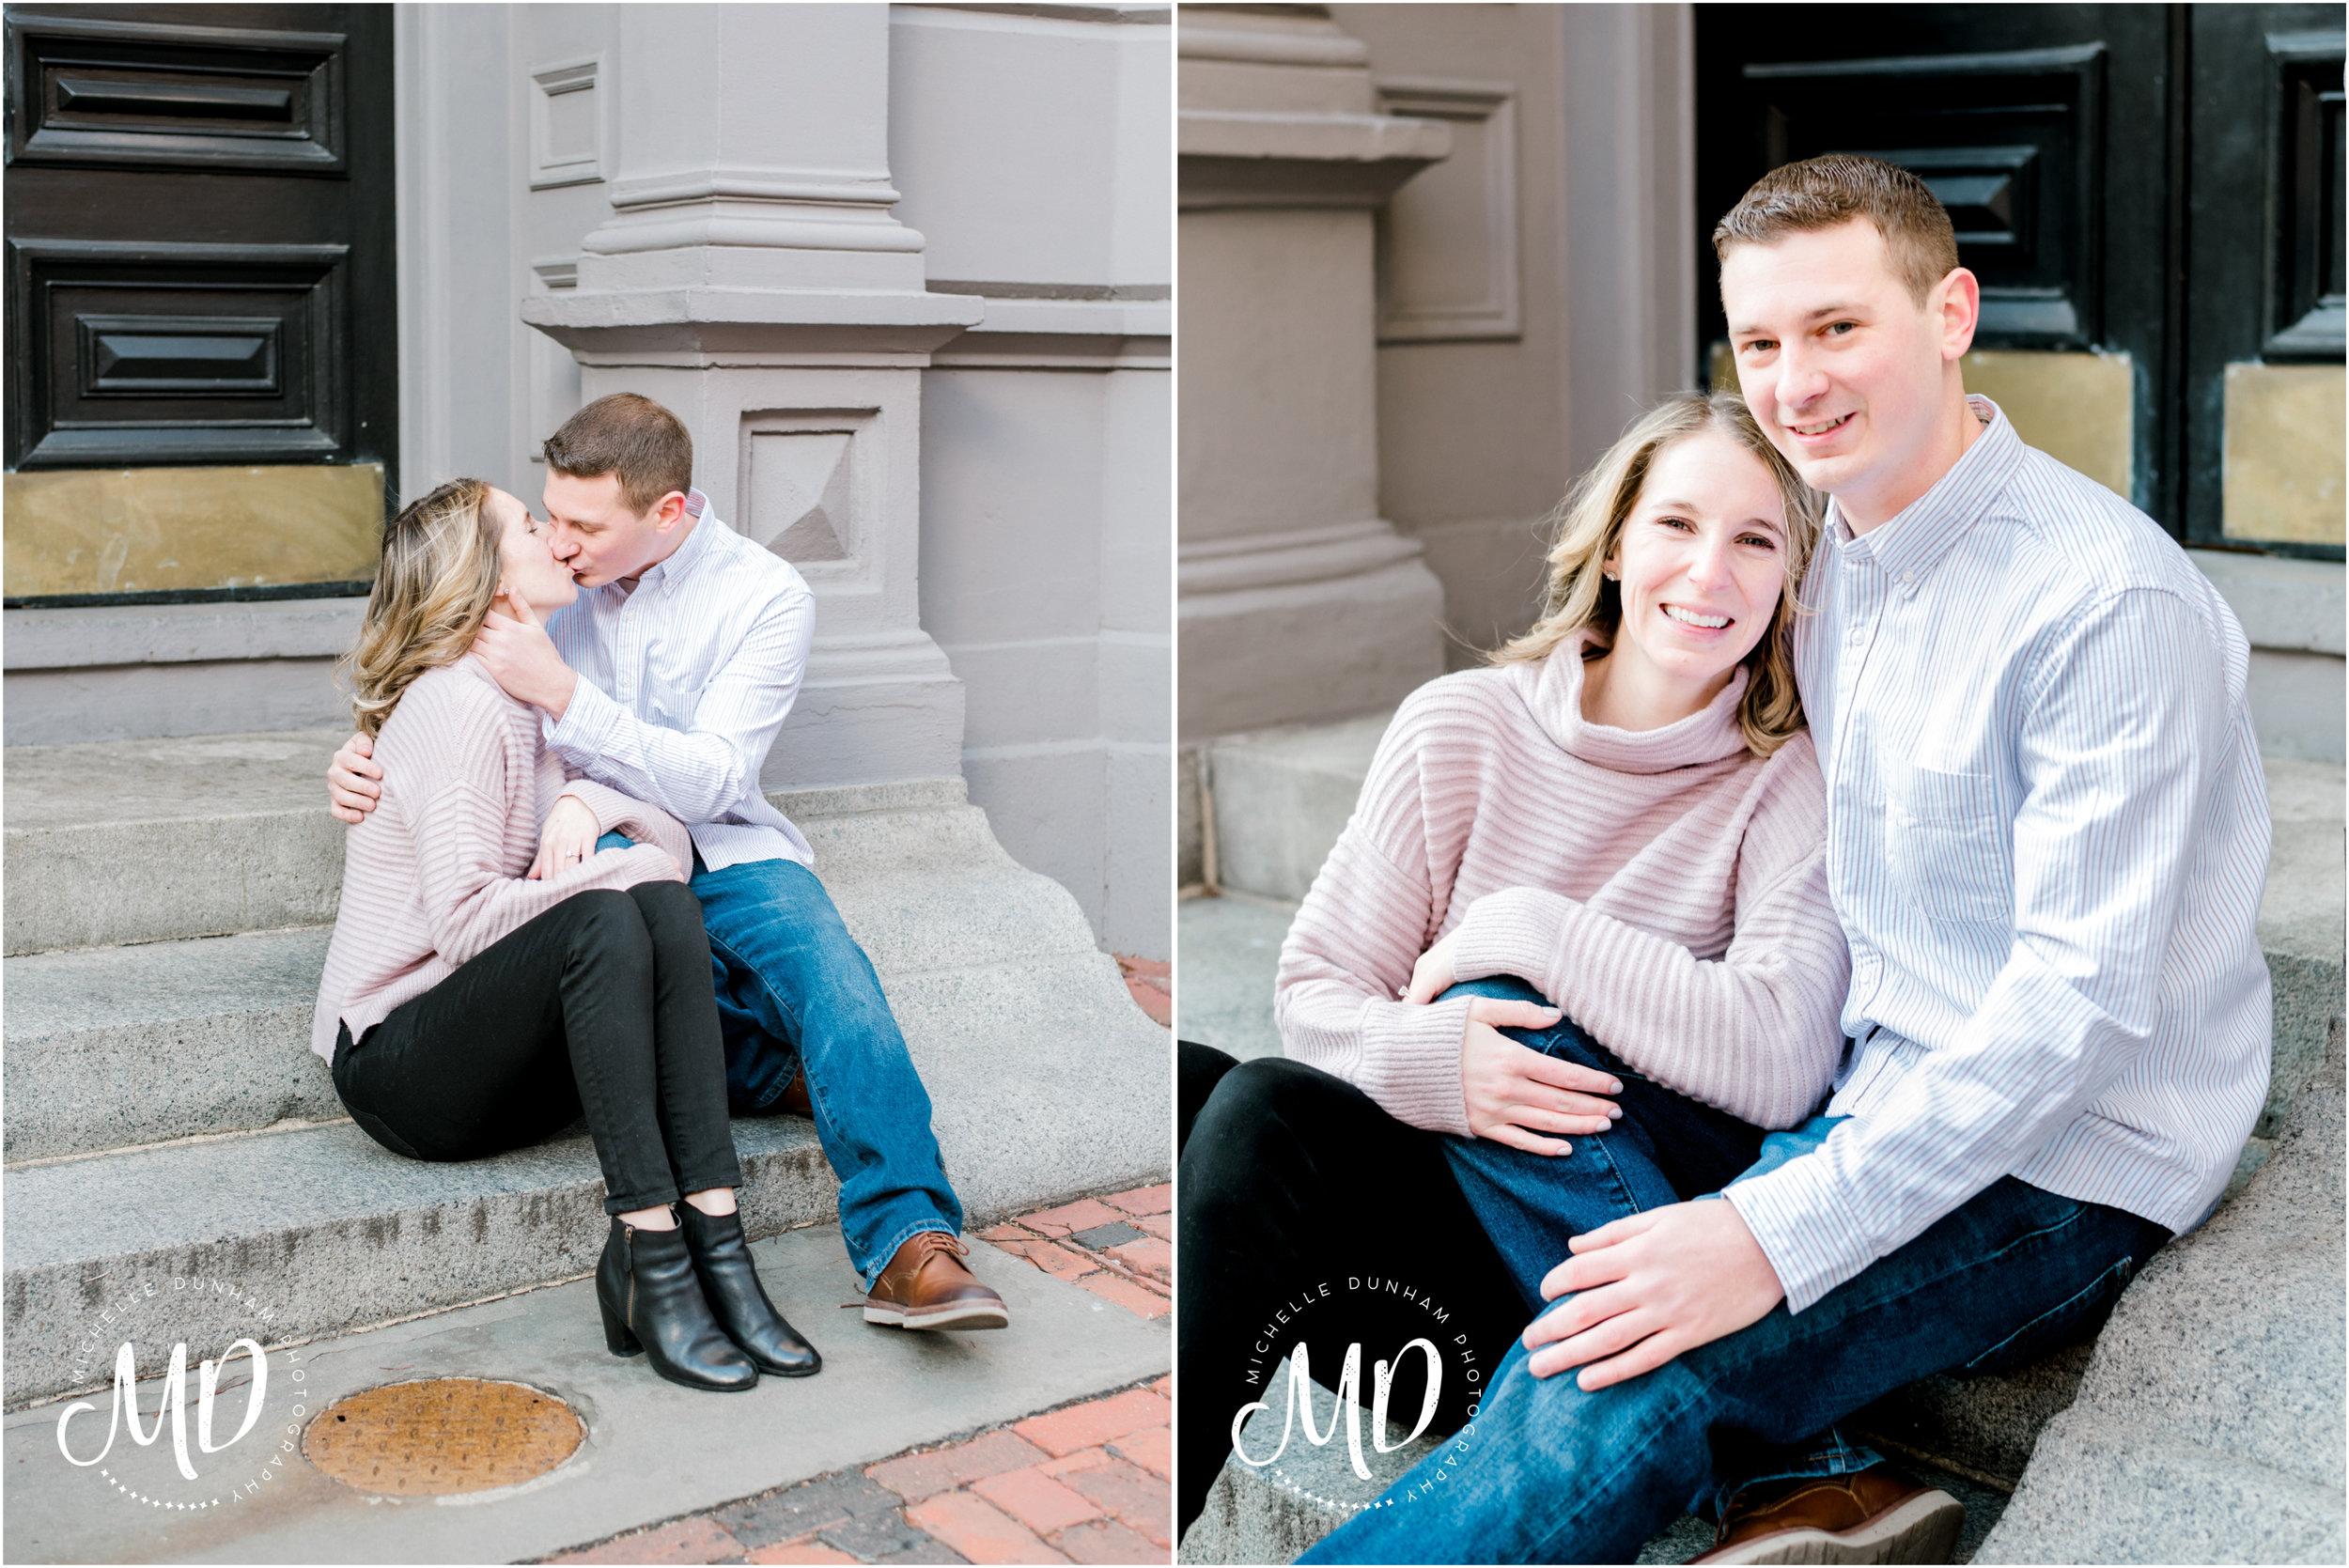 Michelle-Dunham-Photography-Beacon-Hill-Engagement-13.jpg